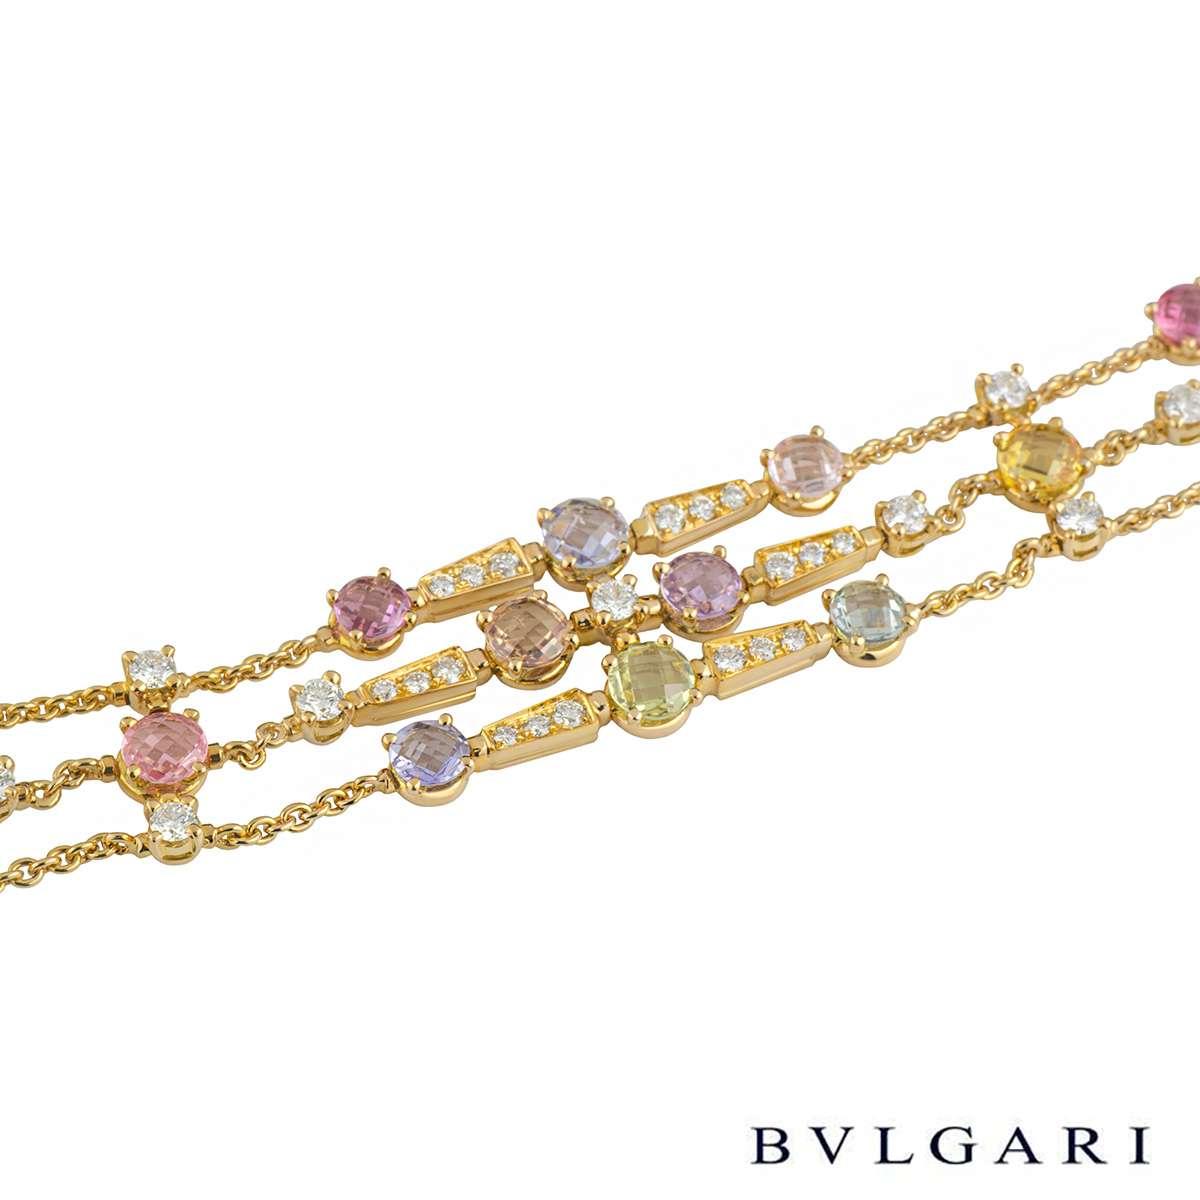 Bvlgari Yellow Gold Multi-Gemstone Rosette Necklace